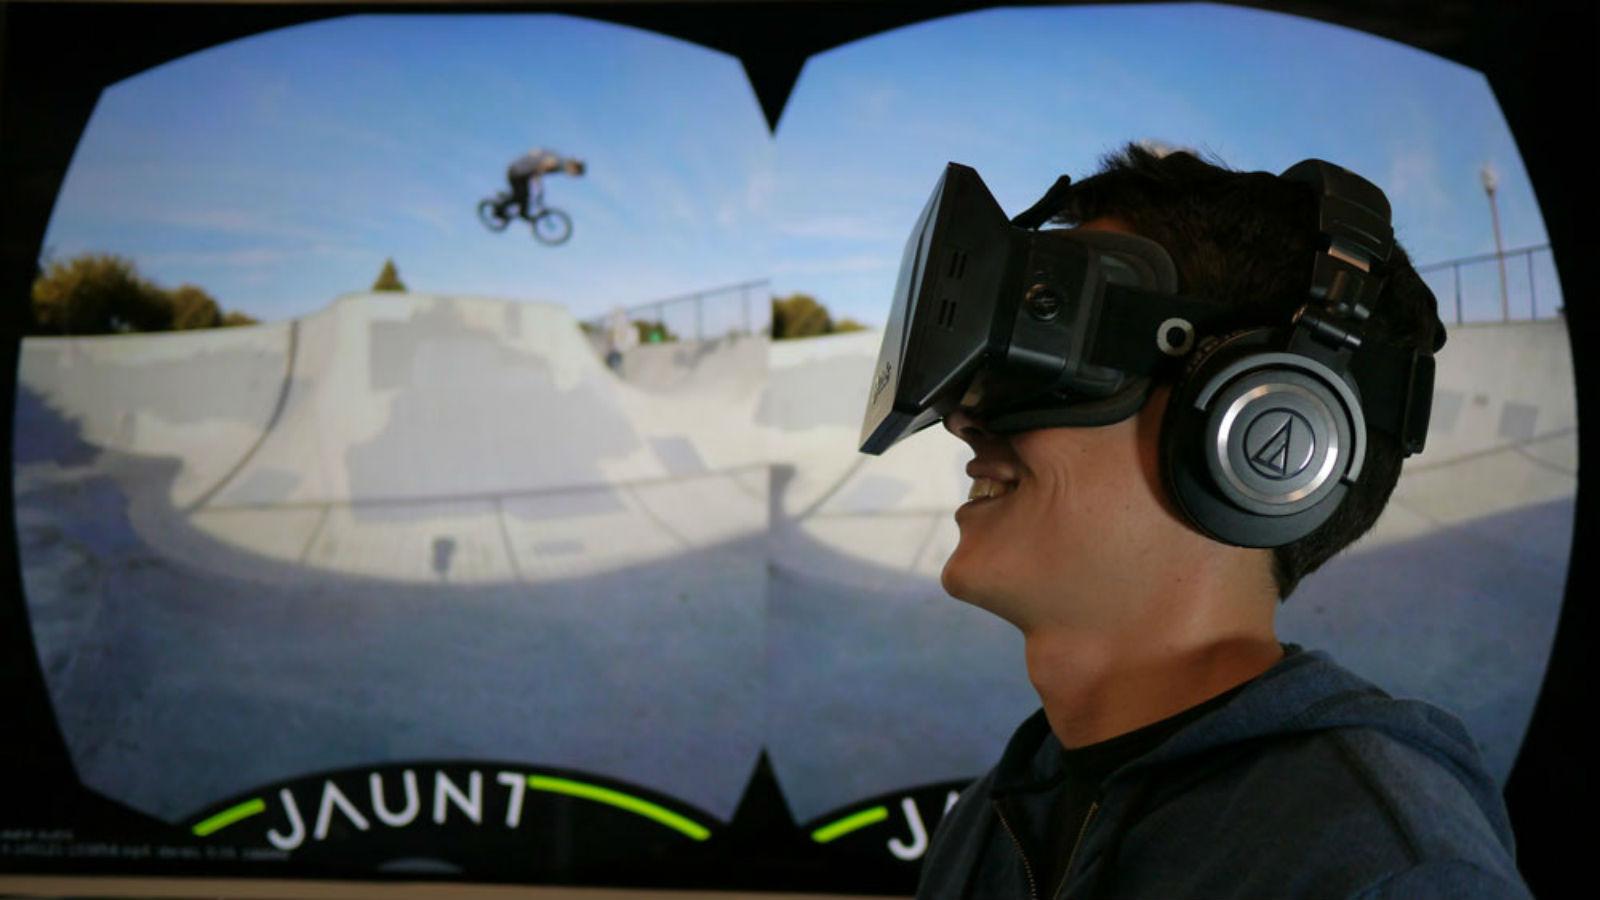 Virtual Reality headset goggles